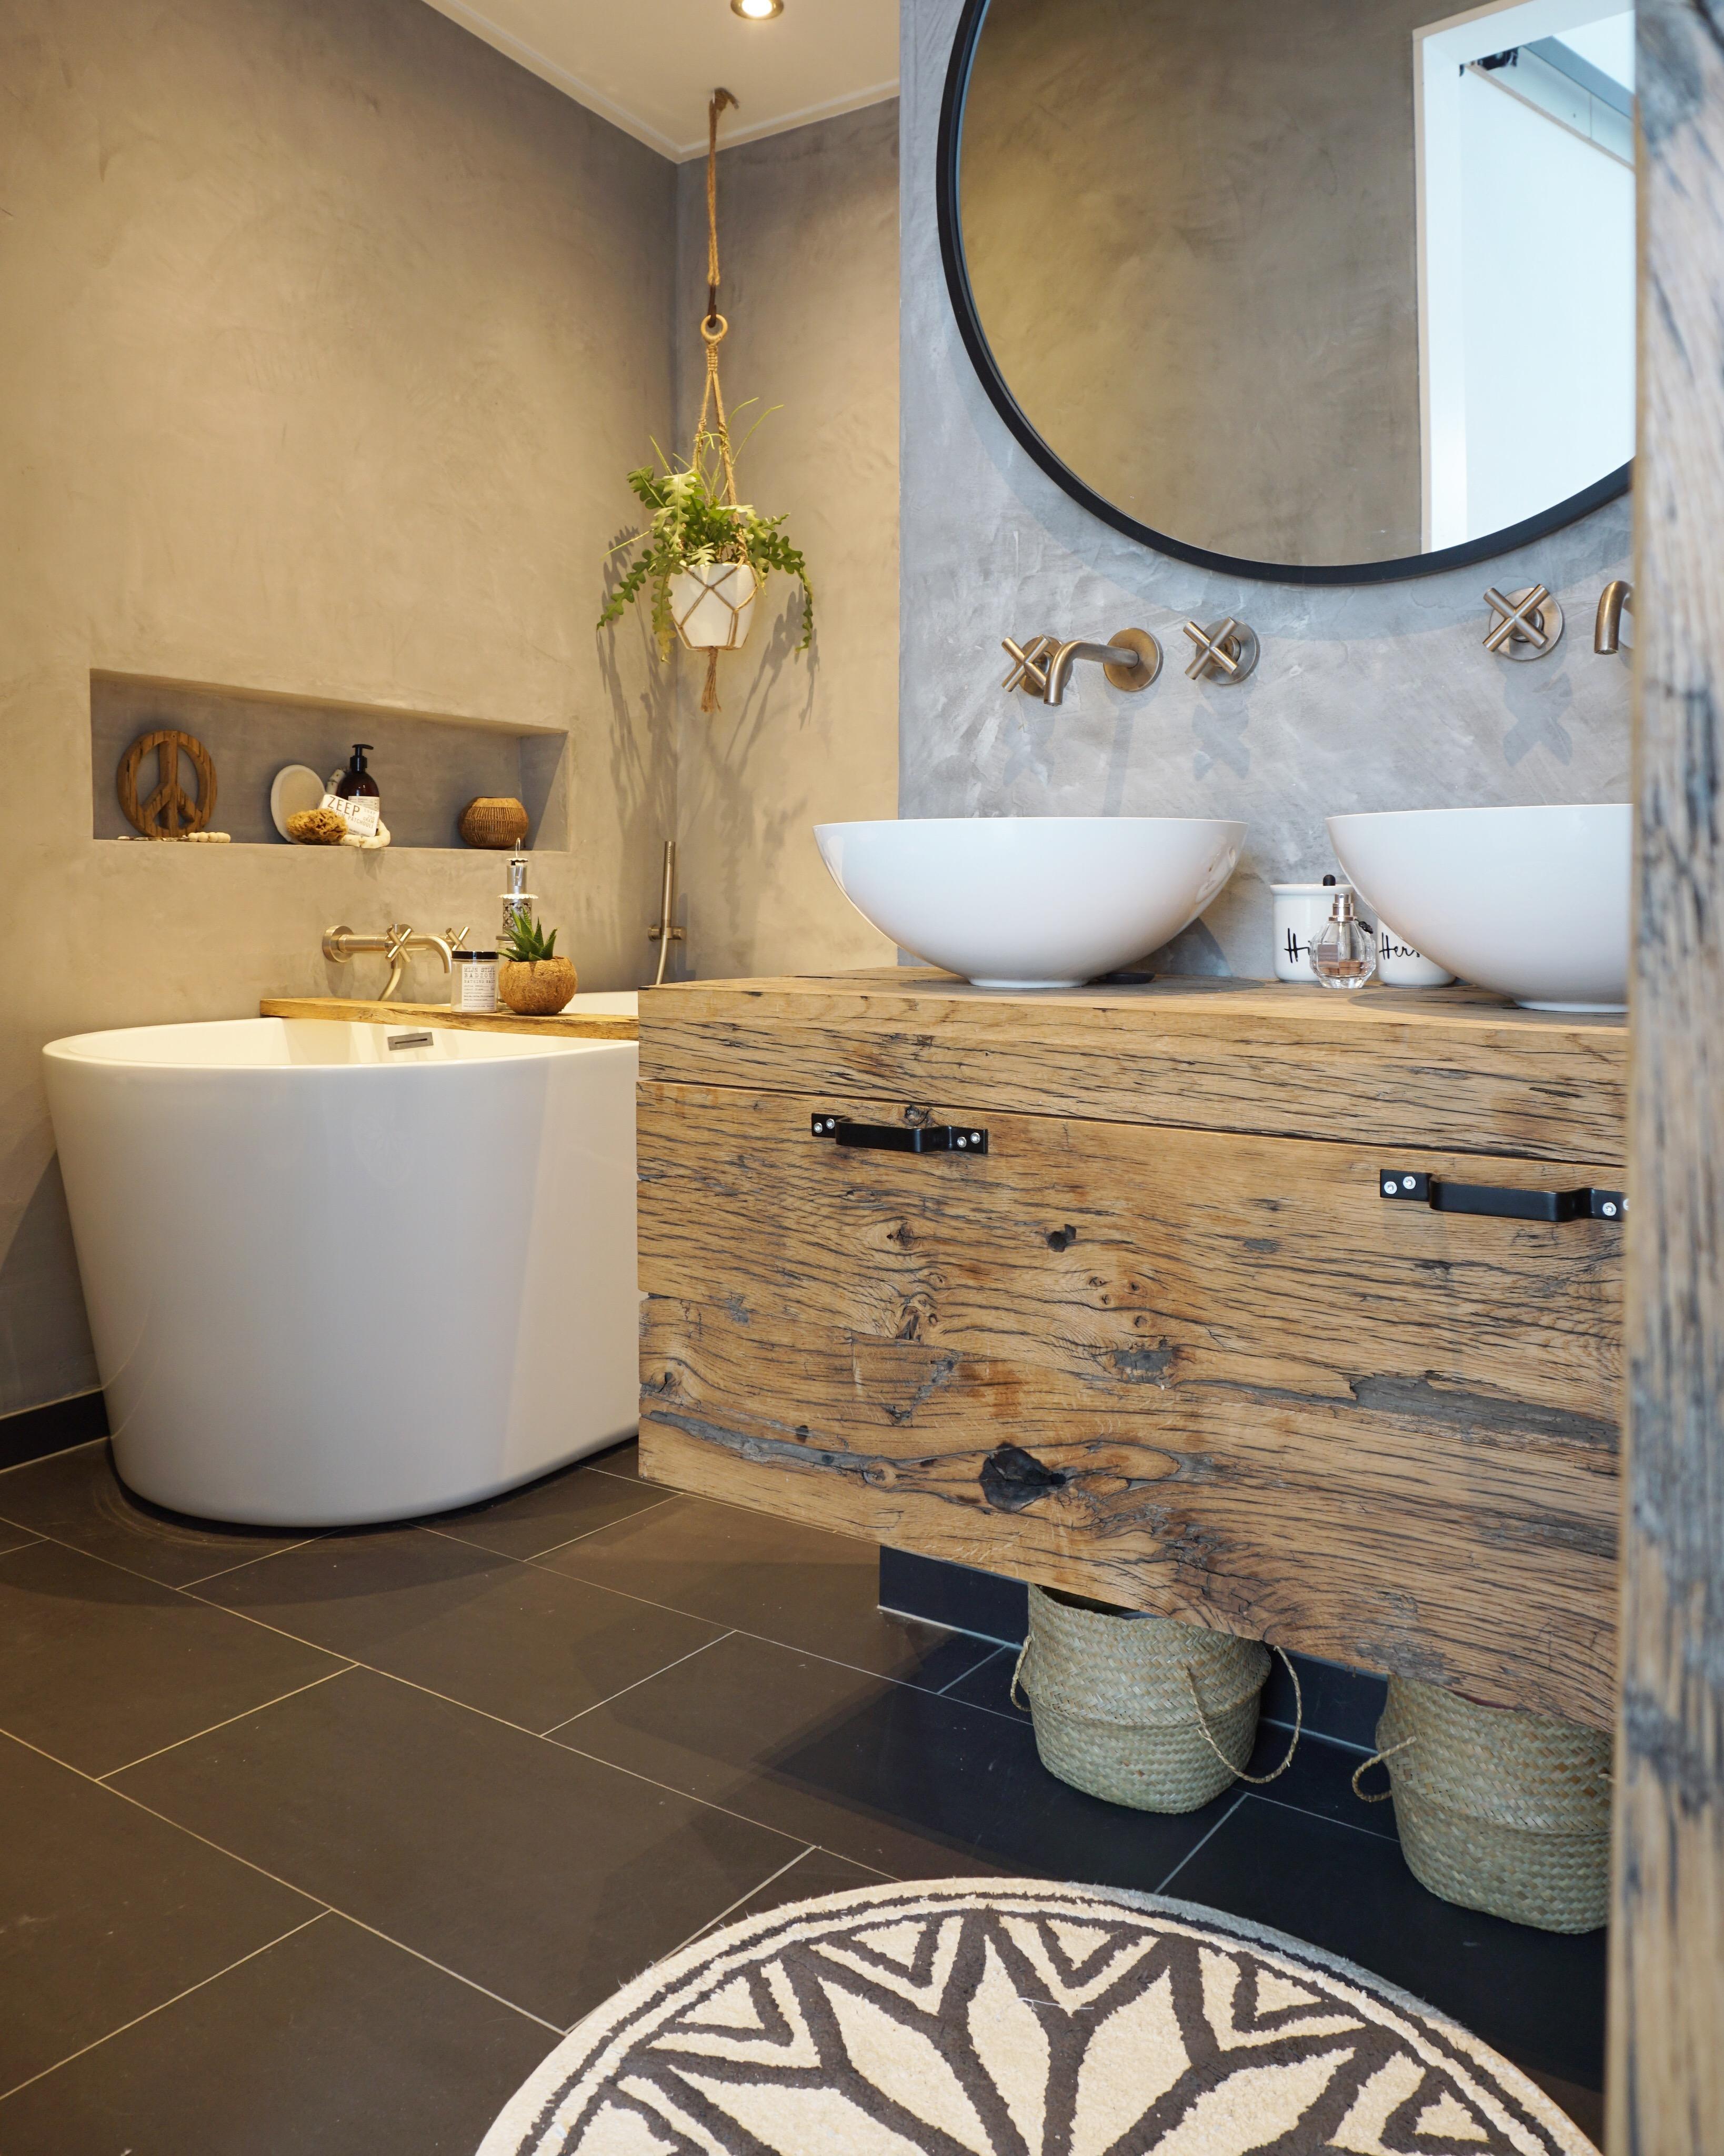 badkamer gouden kranen en zwarte spiegel